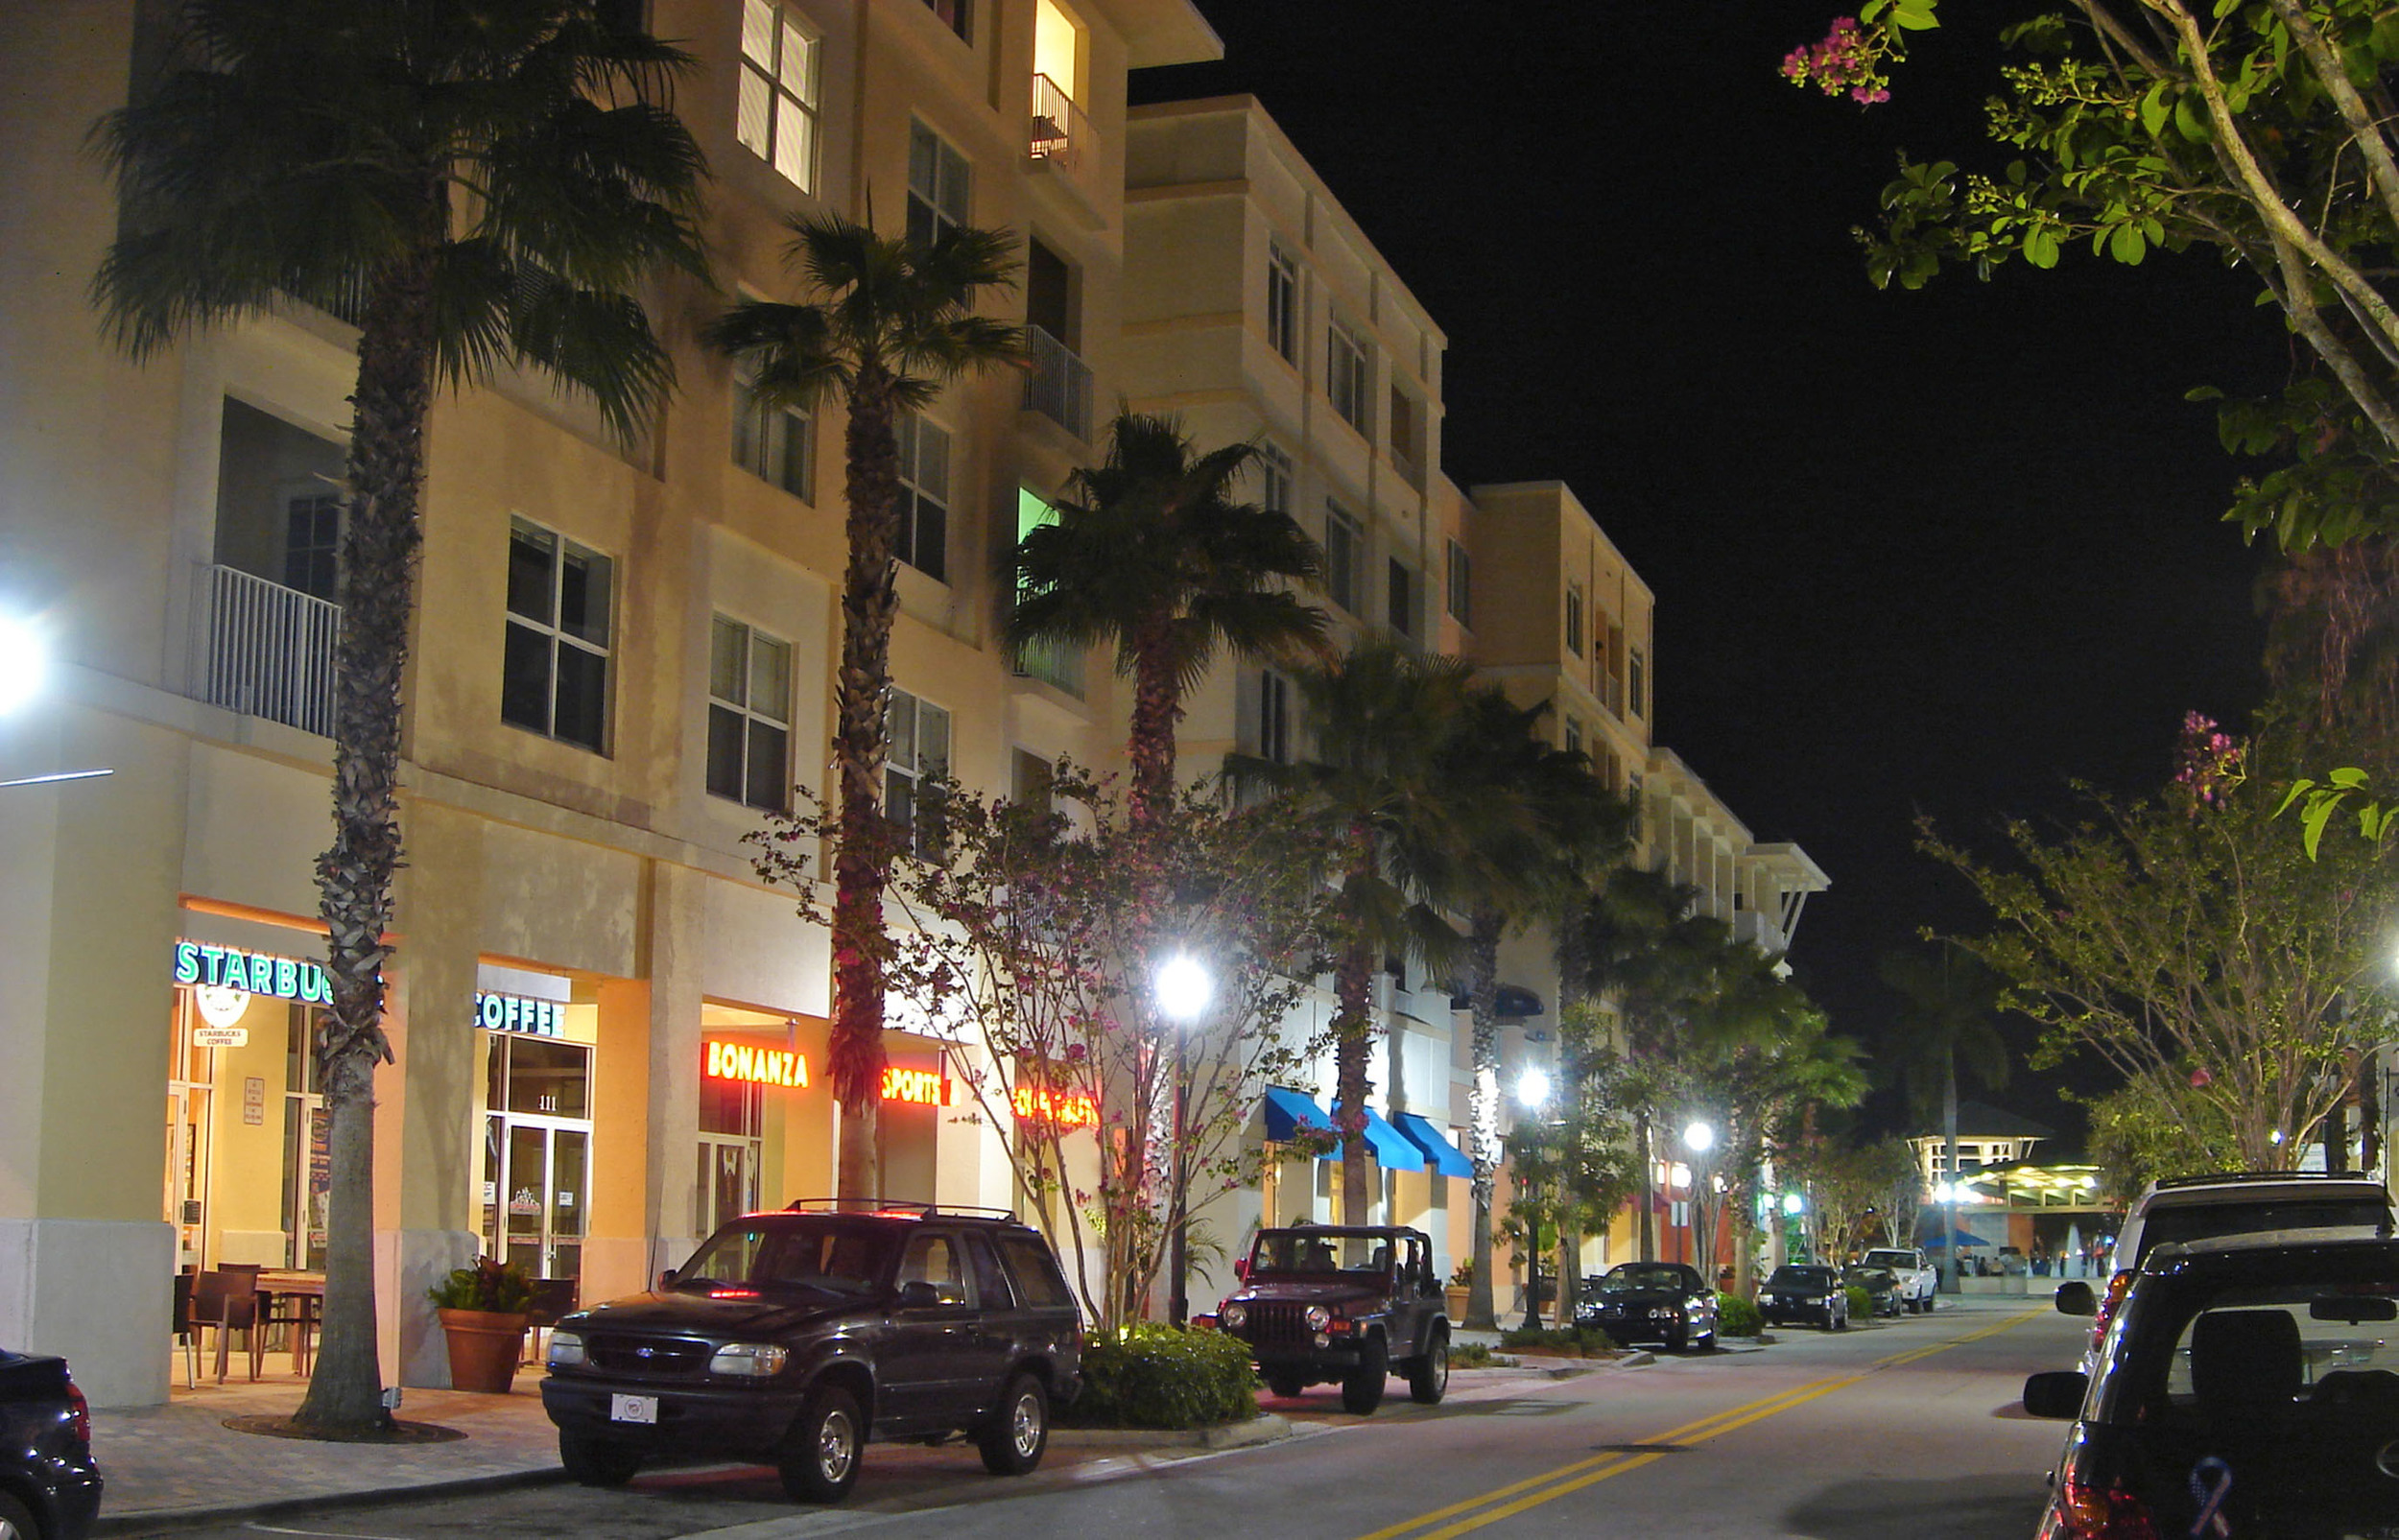 Abacoa Town Center Jupiter Florida Lively Night Streetscape.jpg